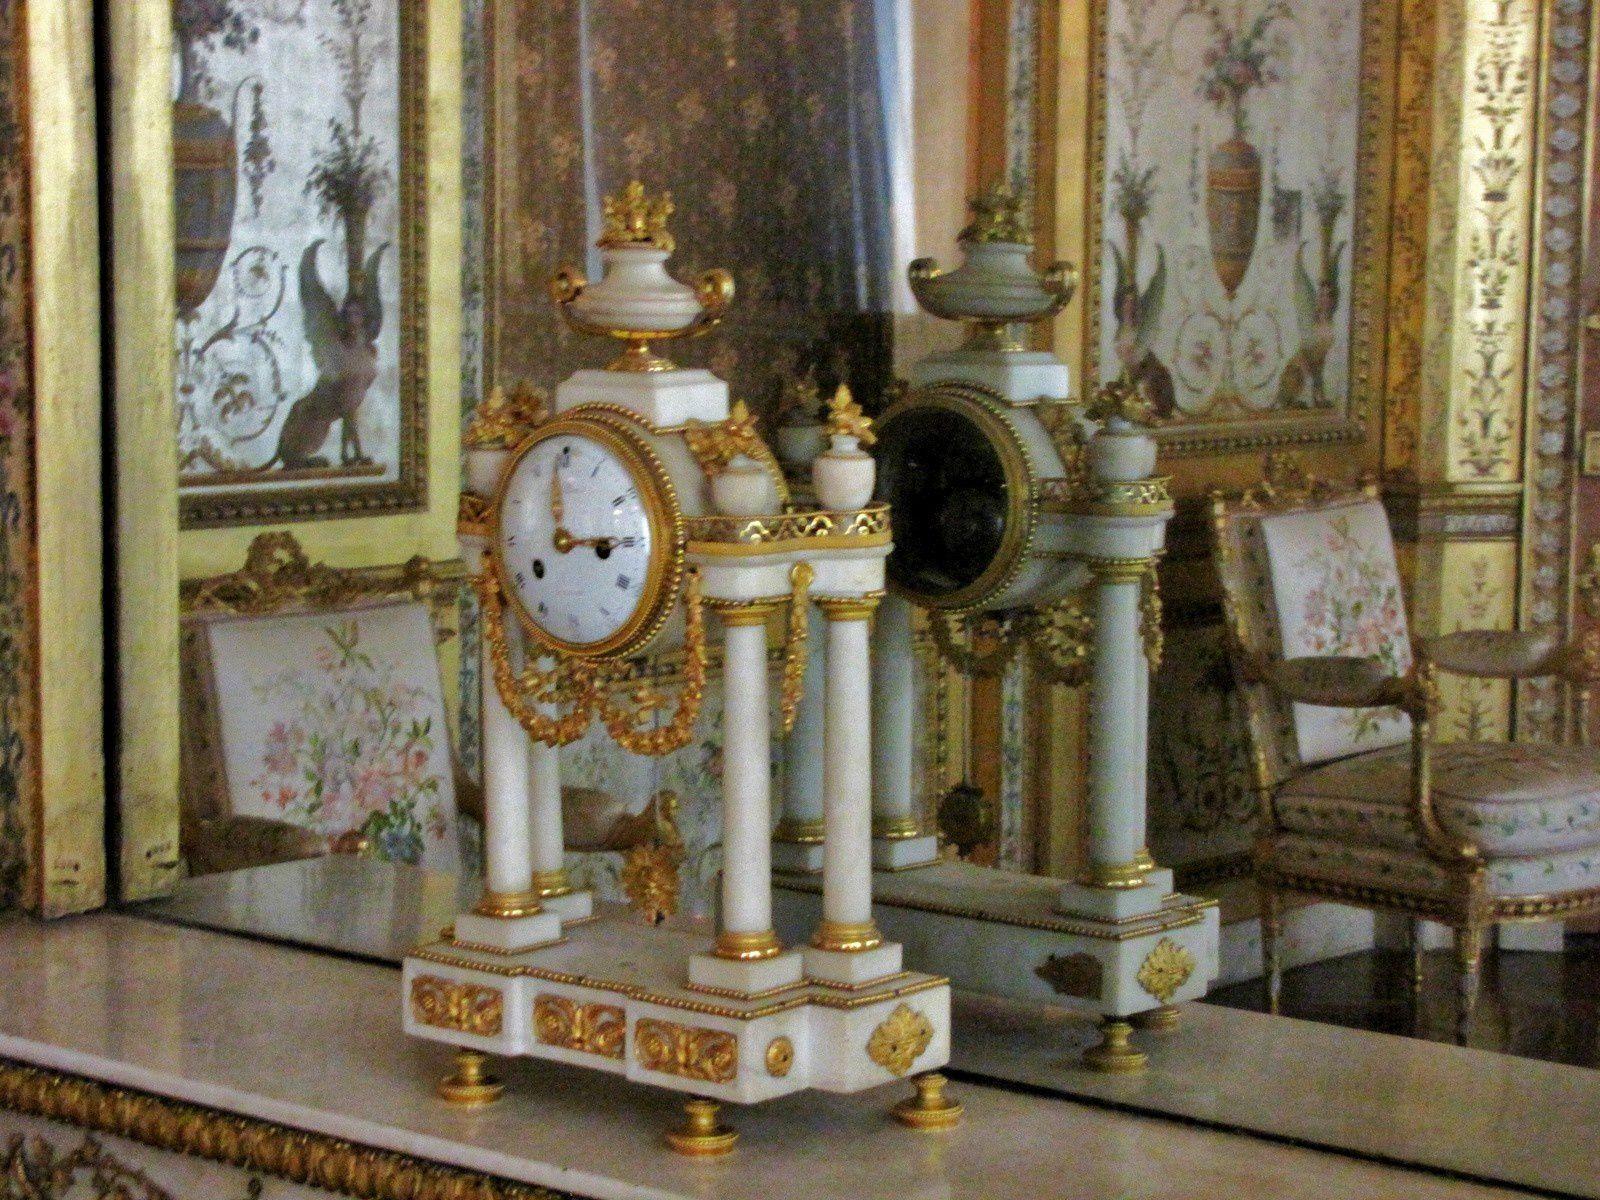 Salle de bain de l'Impératrice, château de Fontainebleau